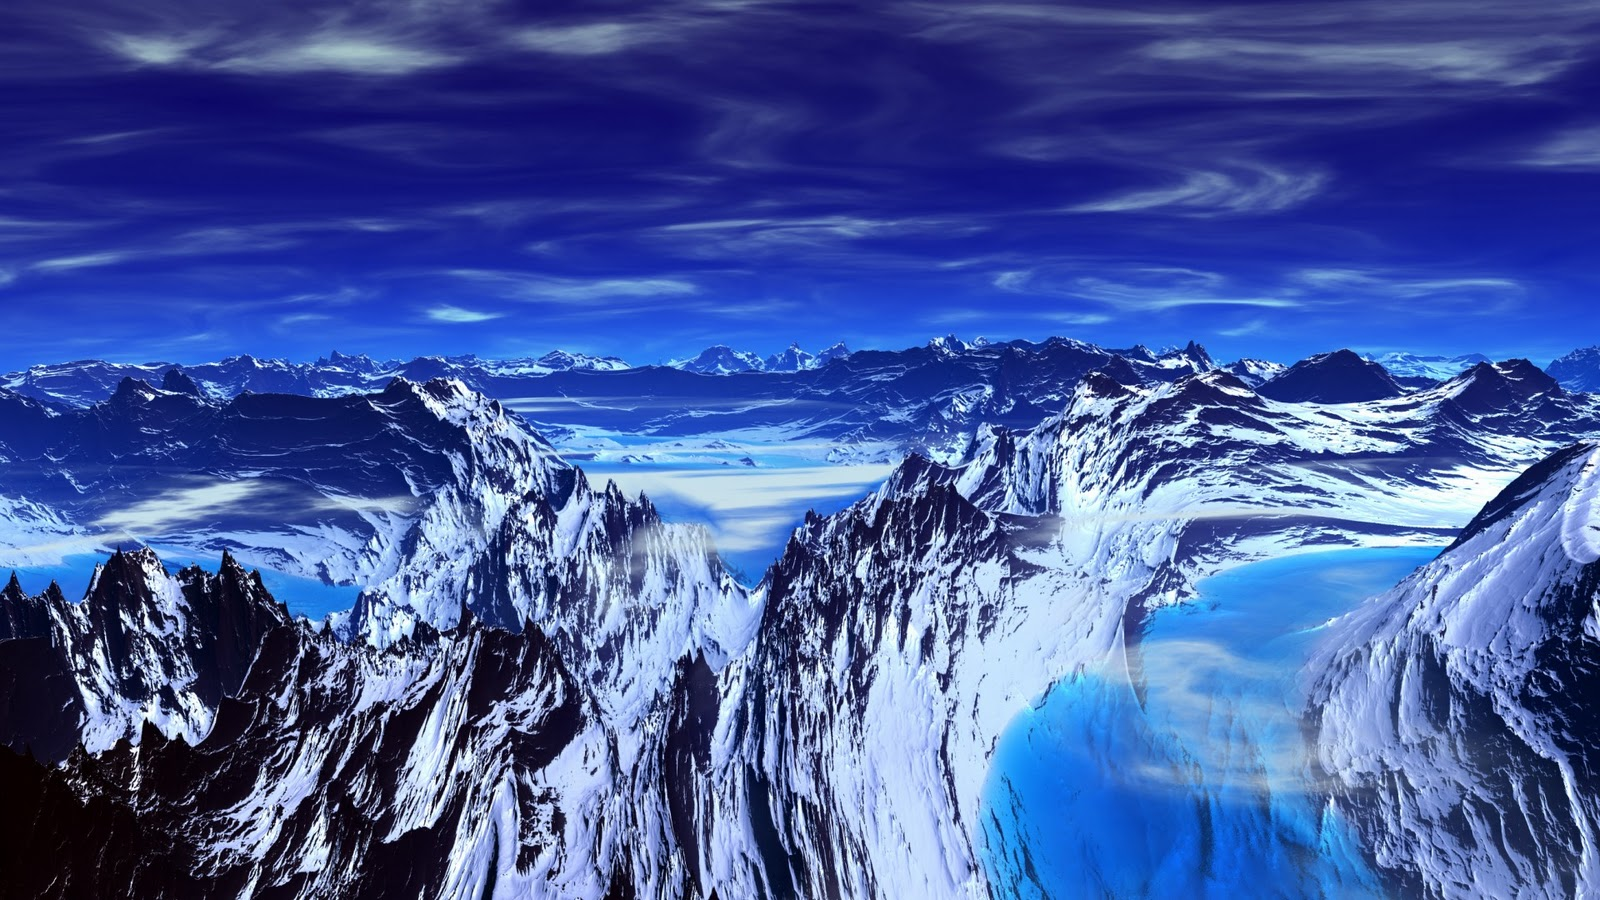 Top Wallpaper Mountain Blue - blue-mountain-hd-wallpaper  Collection_249369.jpg